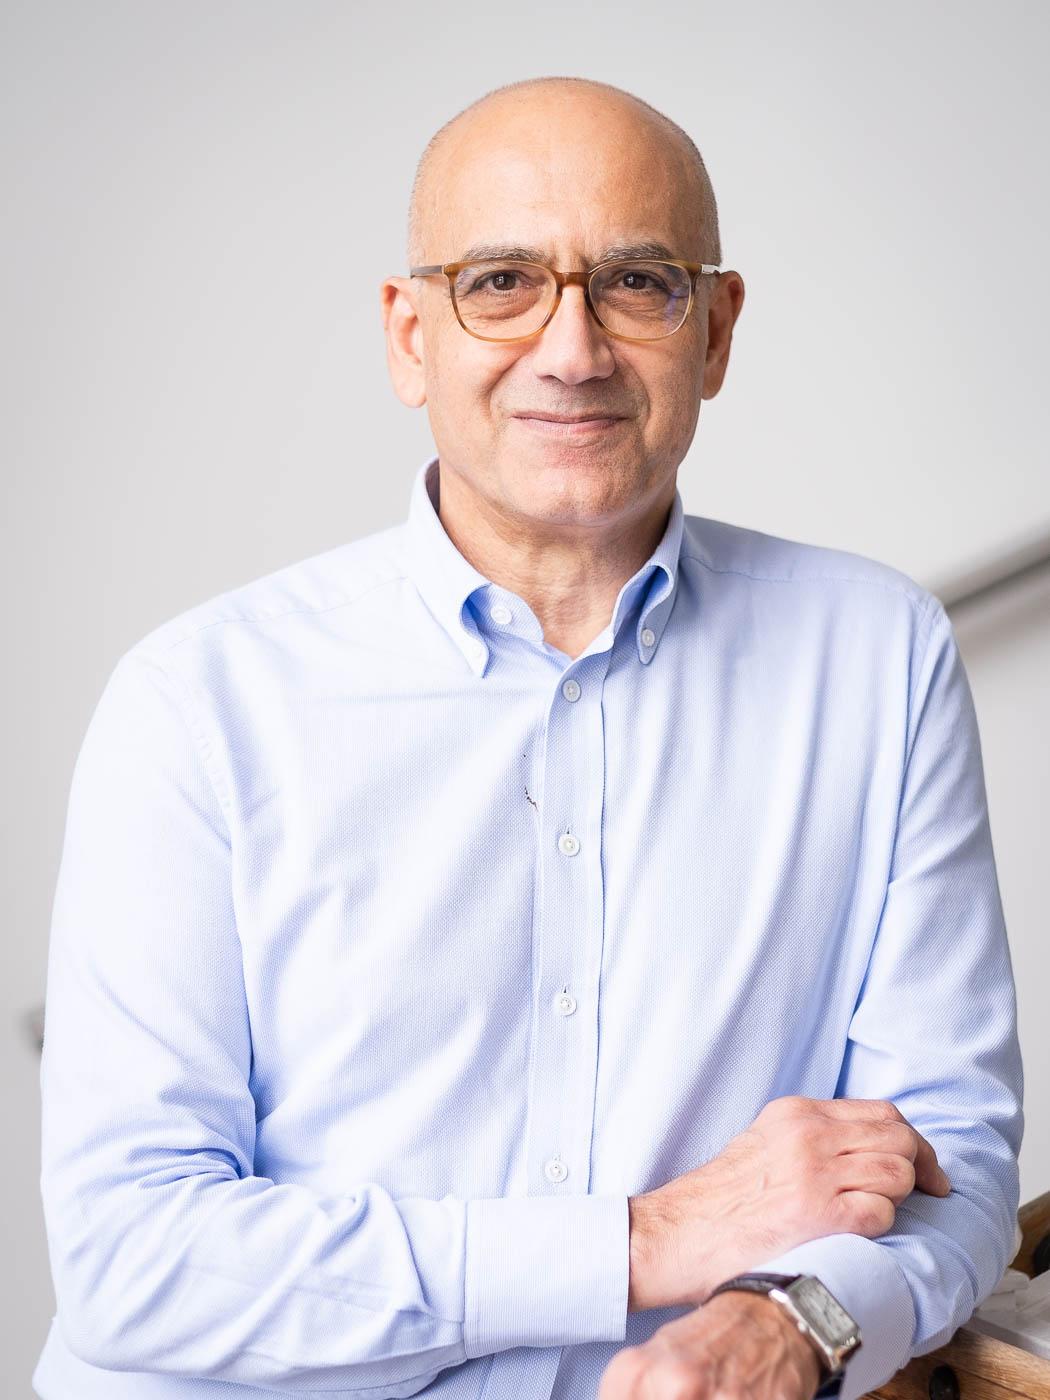 Gefäßdiagnostik und Gefäßtherapie | Dr. Gerard Mertikian